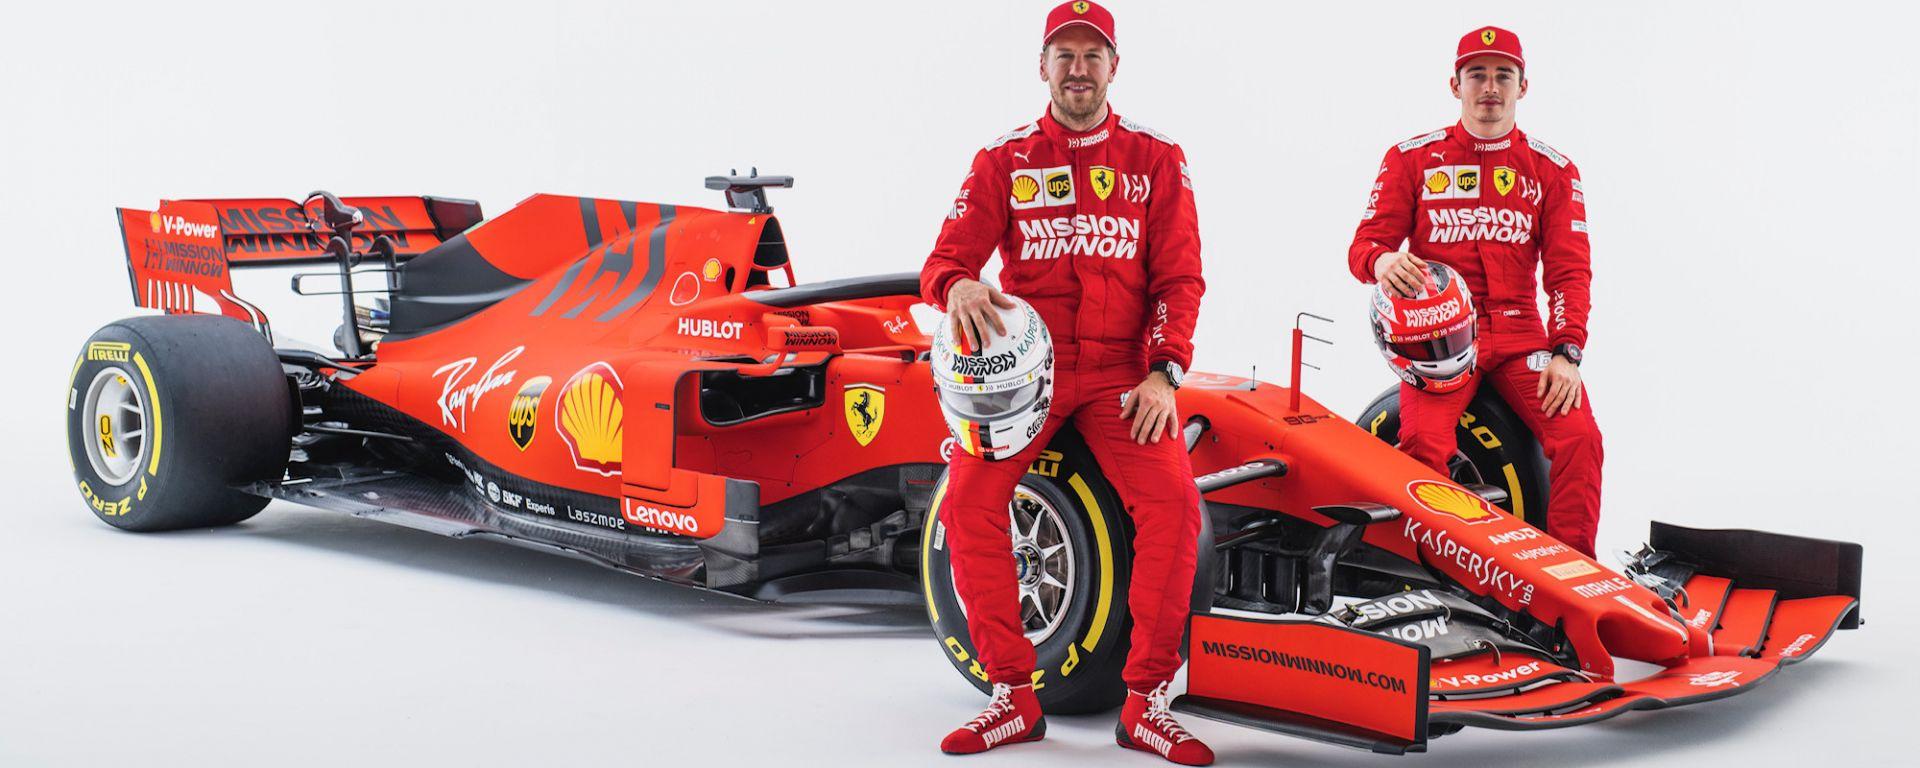 Scuderia Ferrari F1 2019